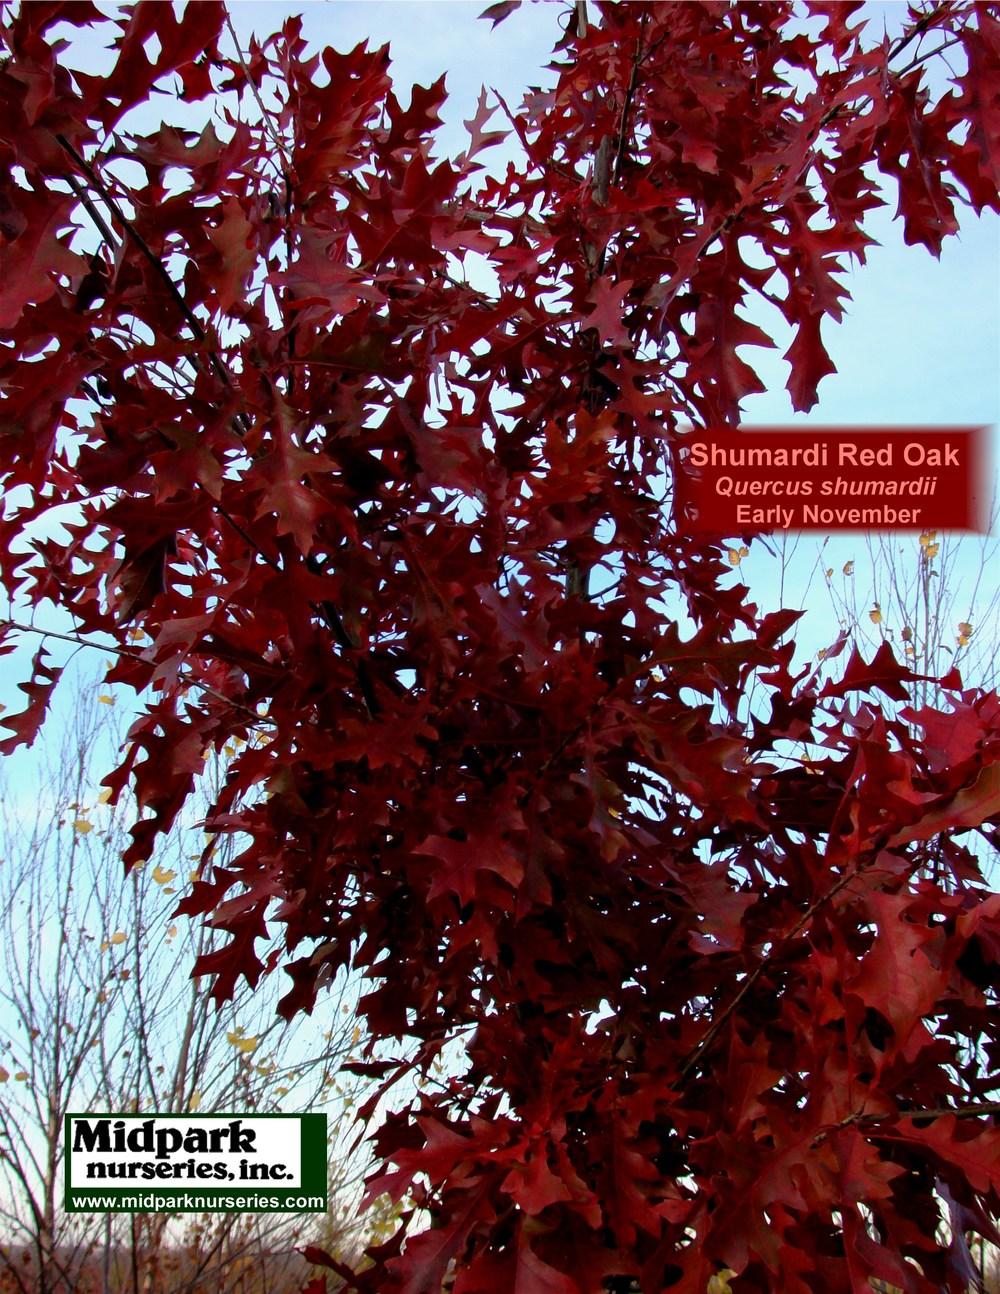 Shumardii_Oak_foliage_11_1107_8x11.jpg